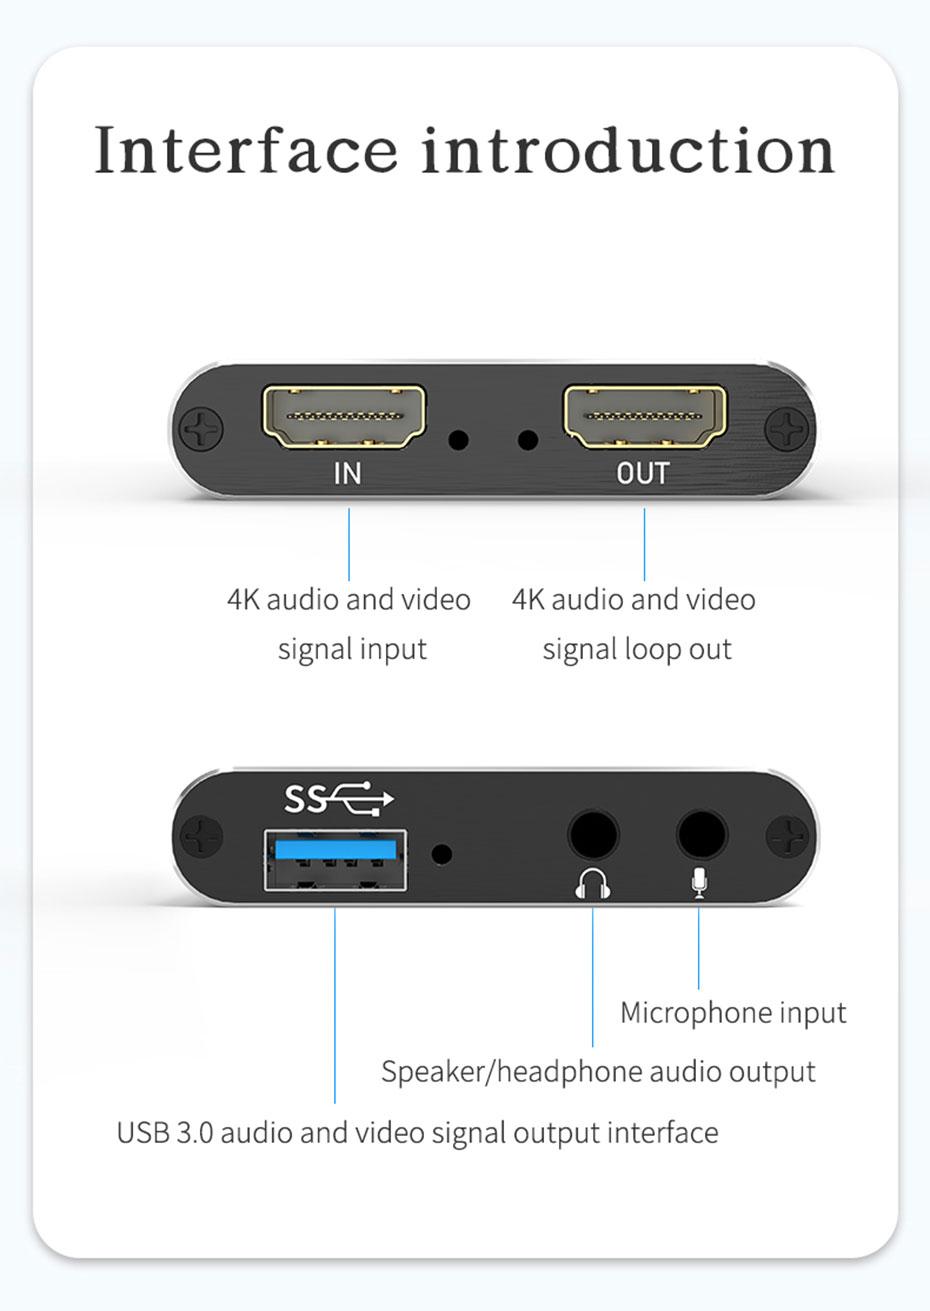 USB3.0 HDMI video capture card HUC03 interface introduction